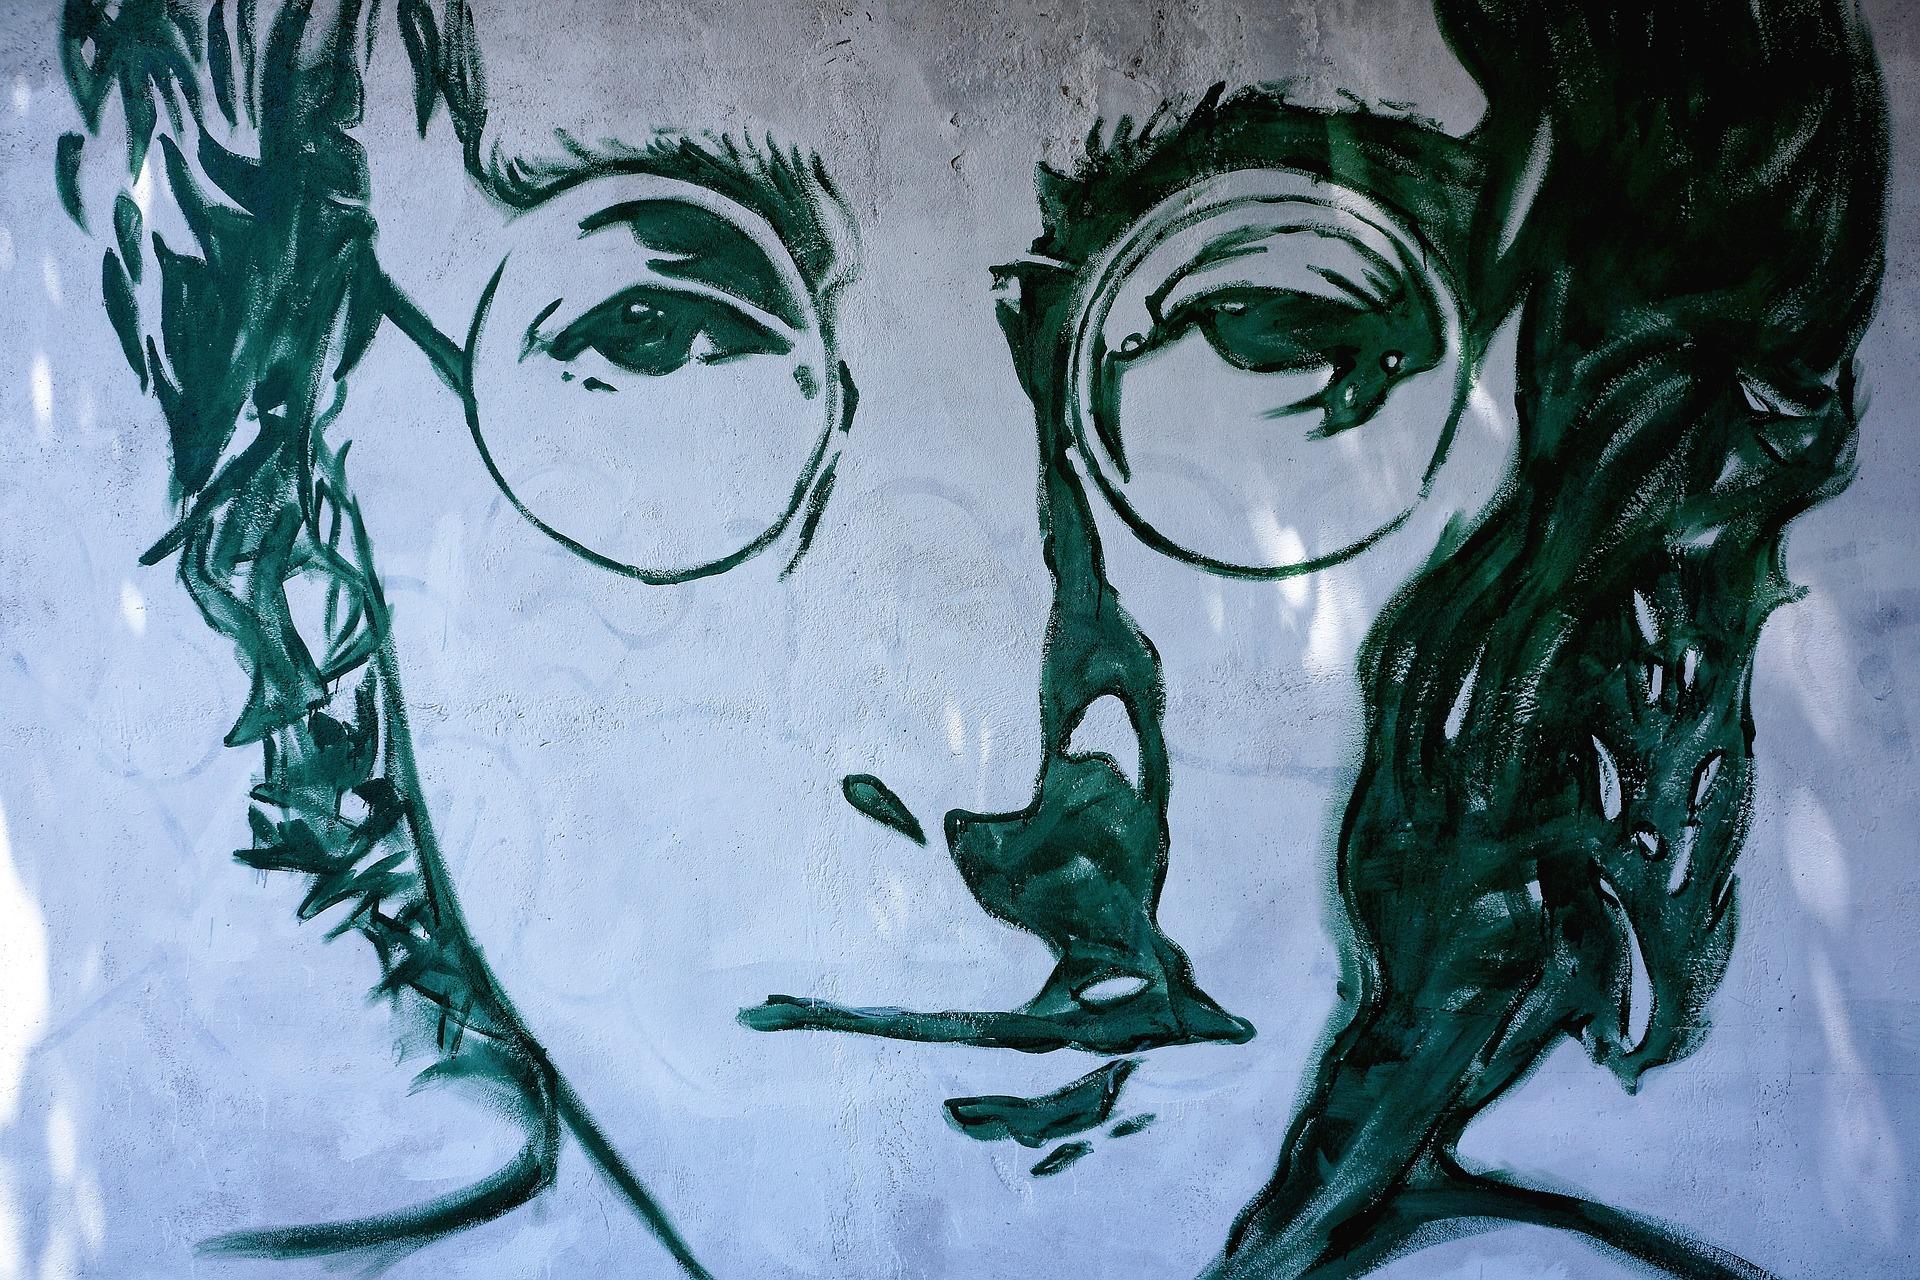 Occhiali tondi stile John Lennon - 1